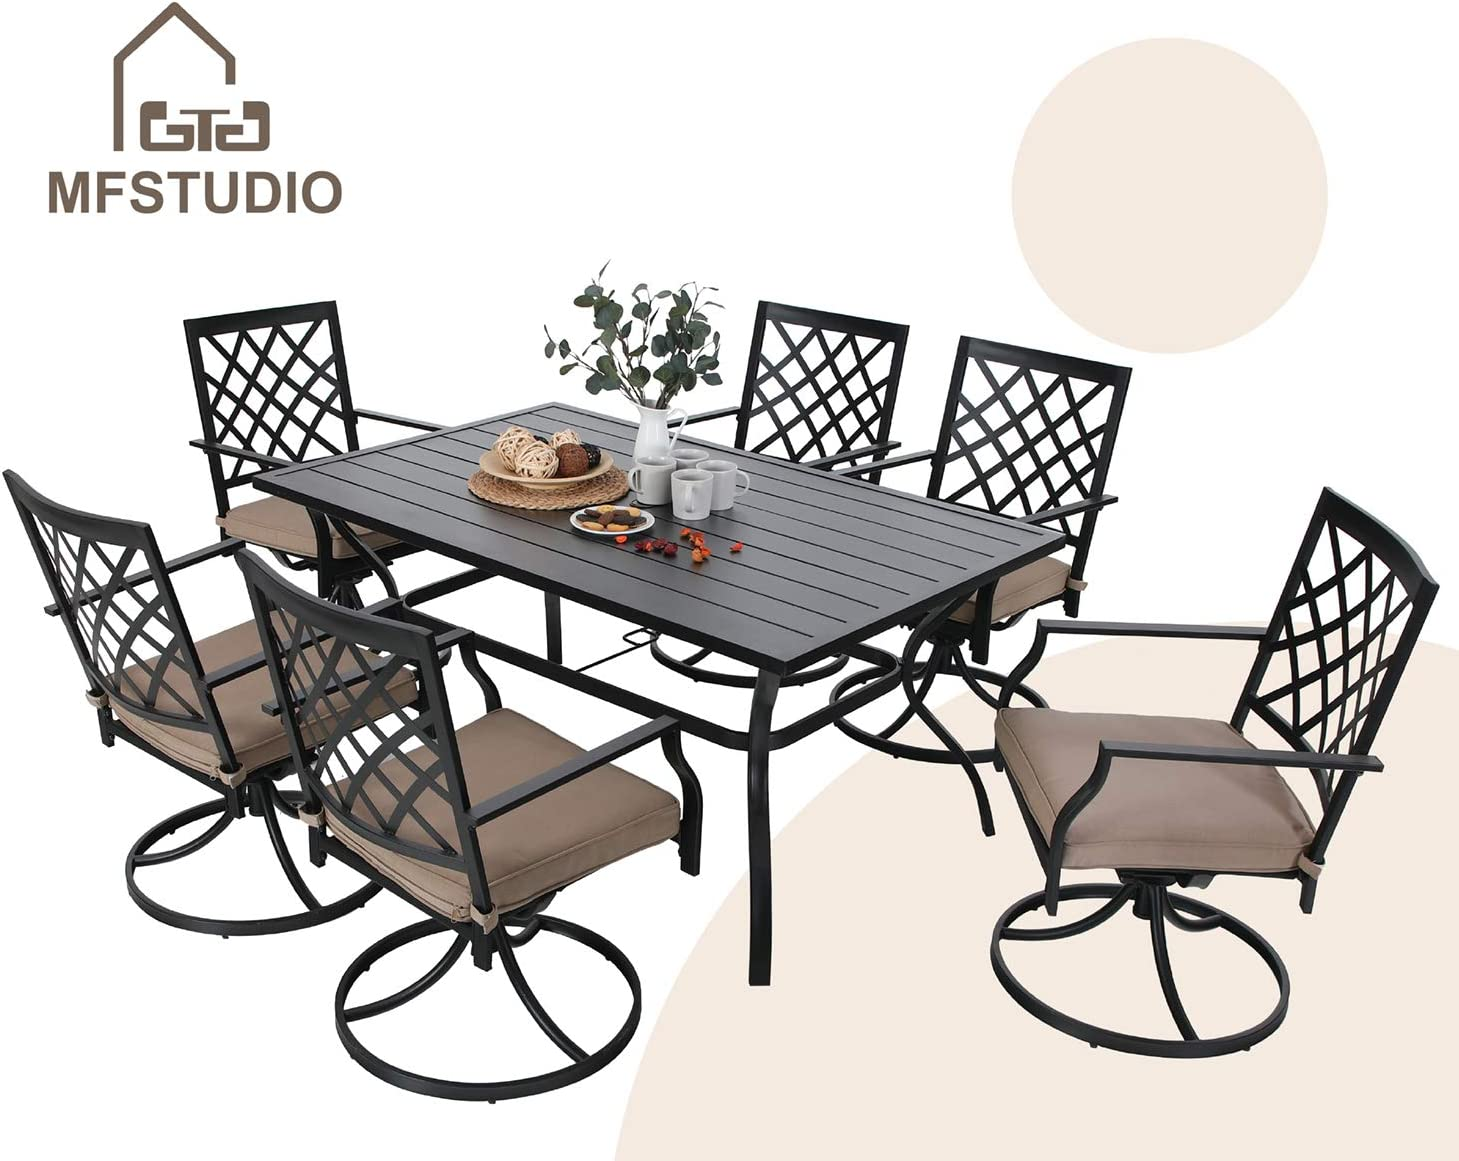 MFSTUDIO 7-Piece Metal Outdoor Patio Dining Bistro Set with 6 Swivel Chairs